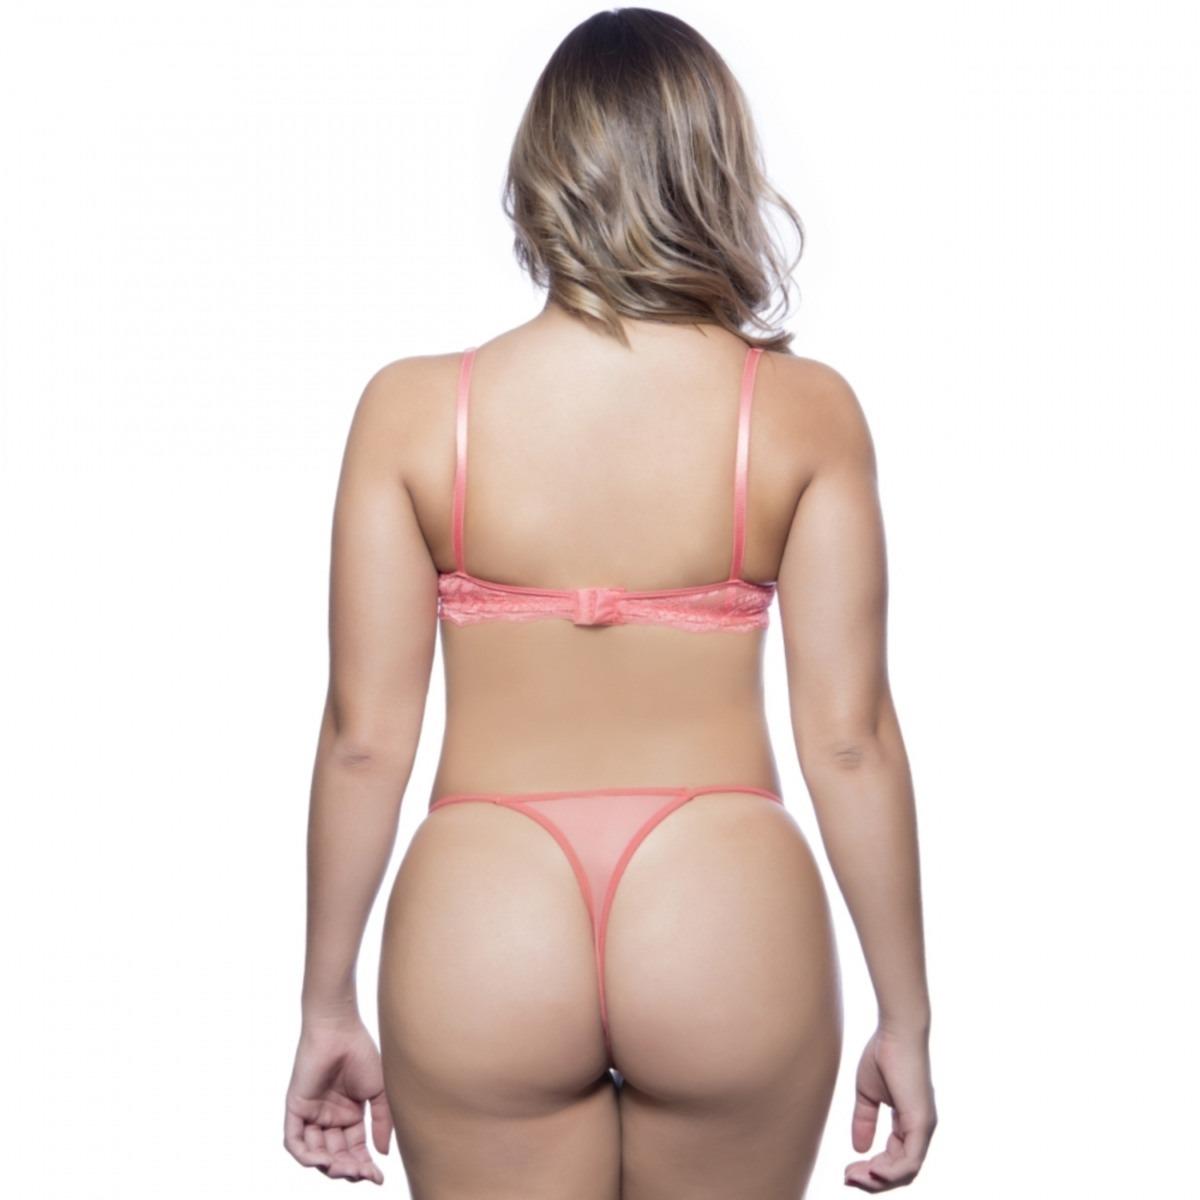 b68619d1f Conjunto Lingerie Sexy Renda Colombian Com Bojo Tam Gg - R  44